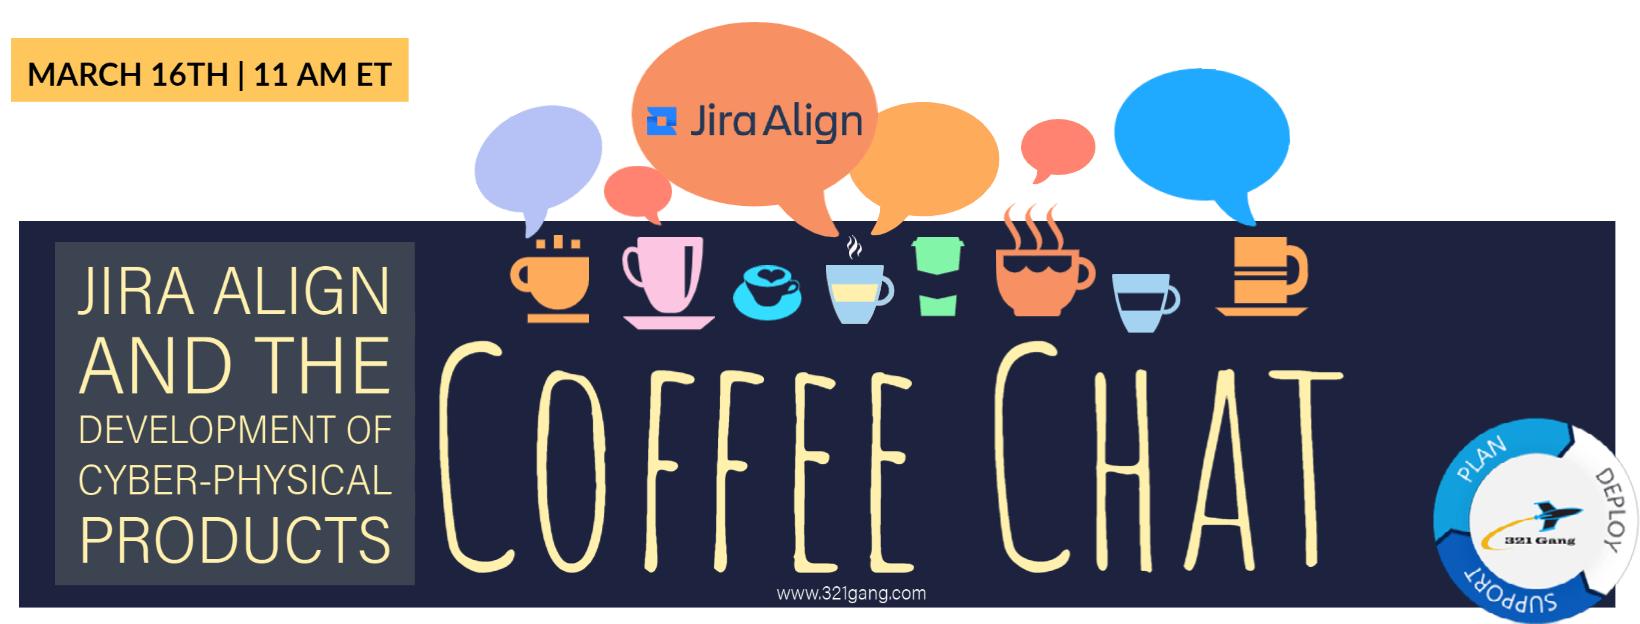 Jira Align Coffee Chat